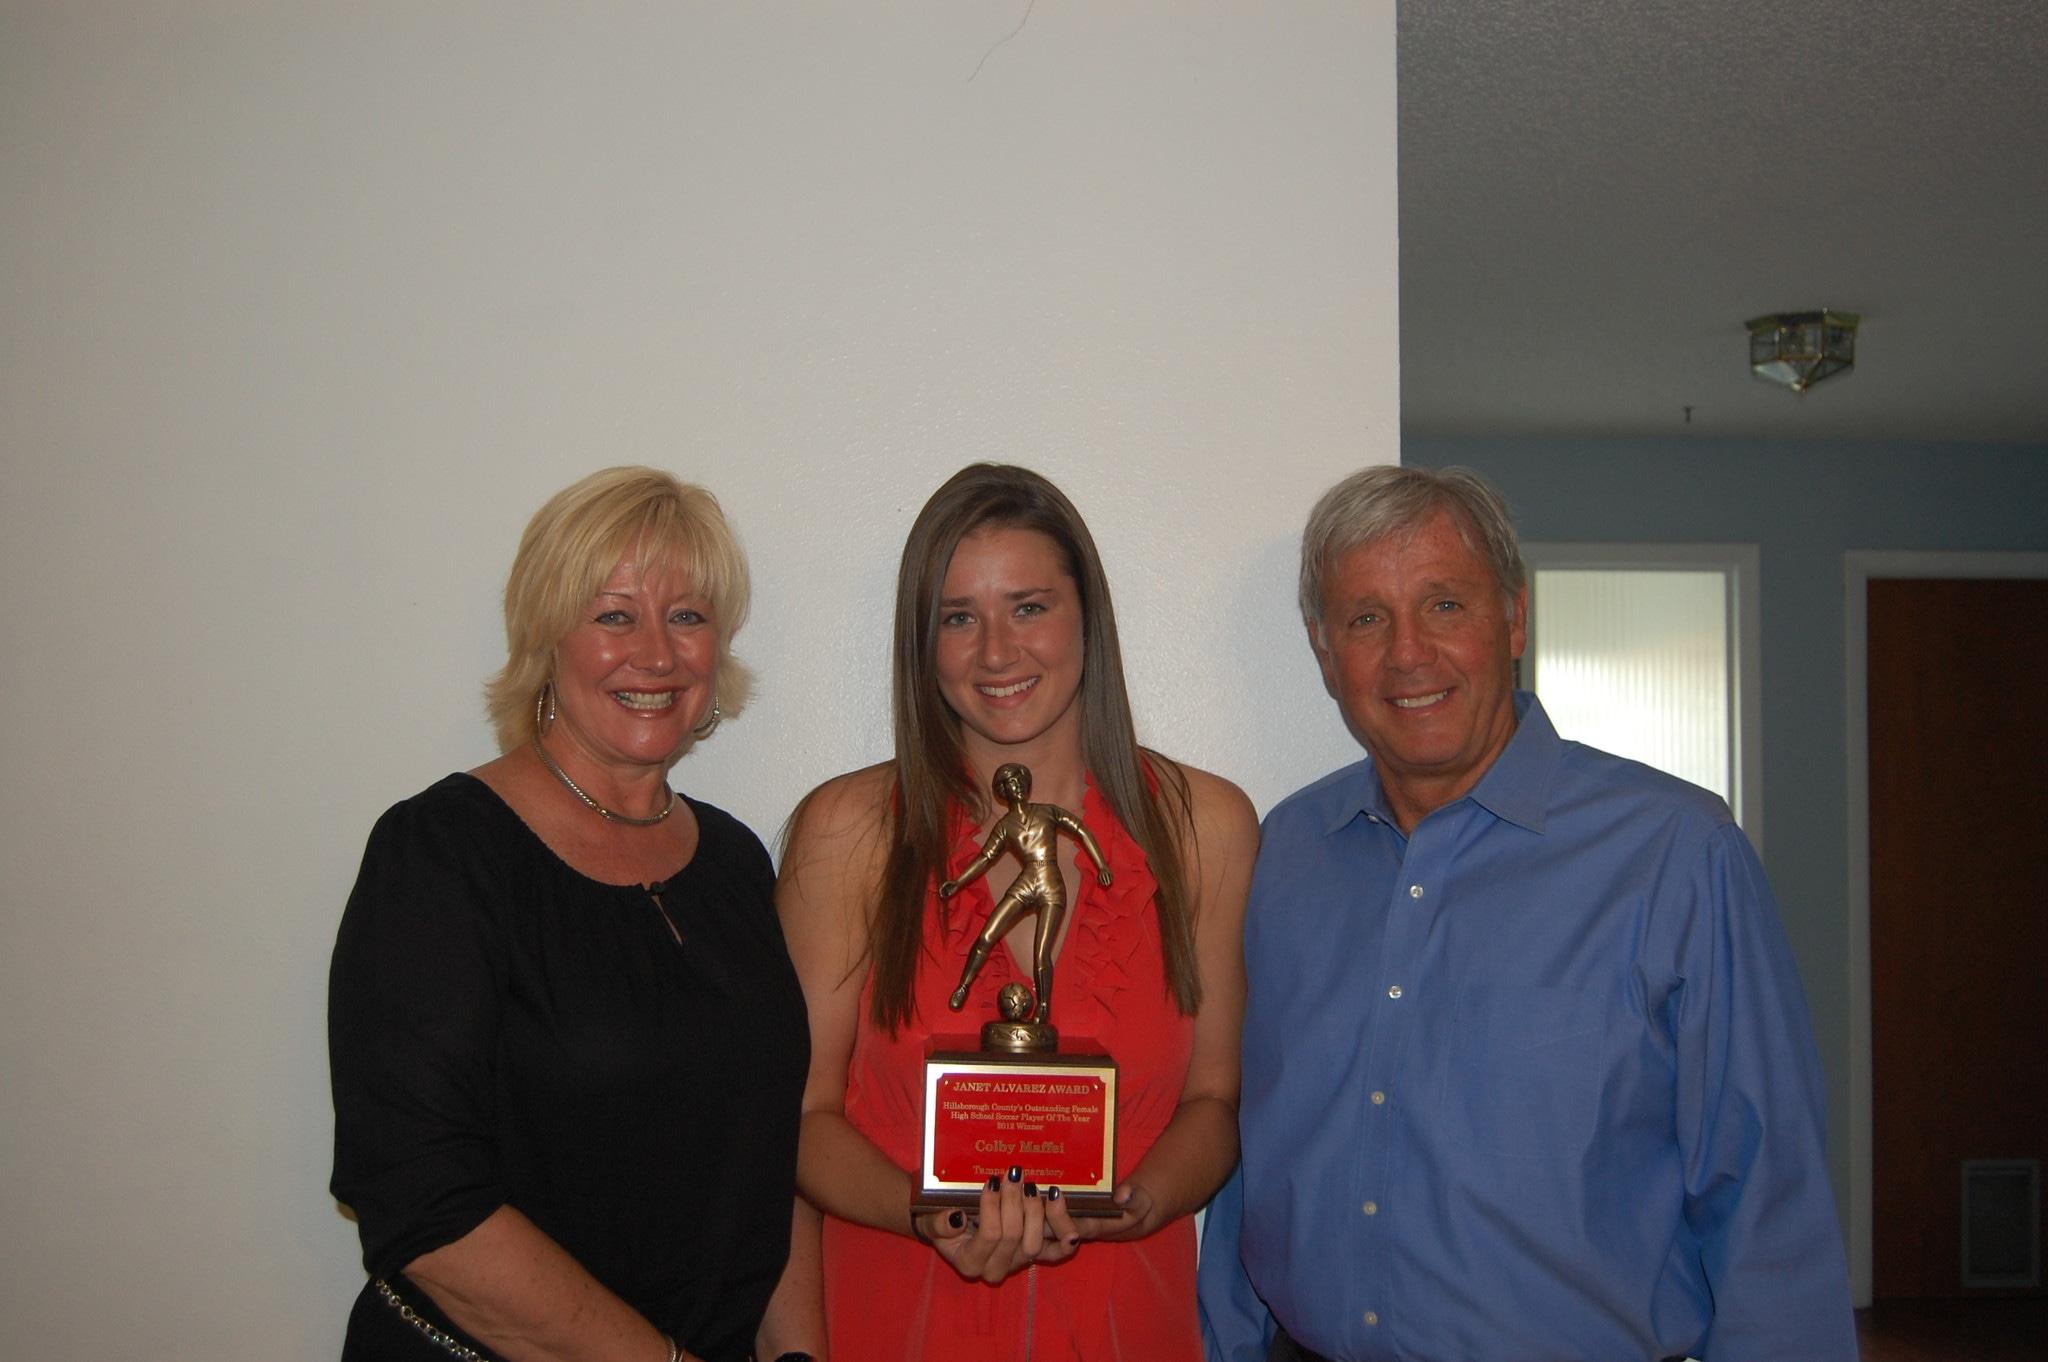 http://alvarezcpa.com/2012-soccer-award/maffei-family-2.JPG